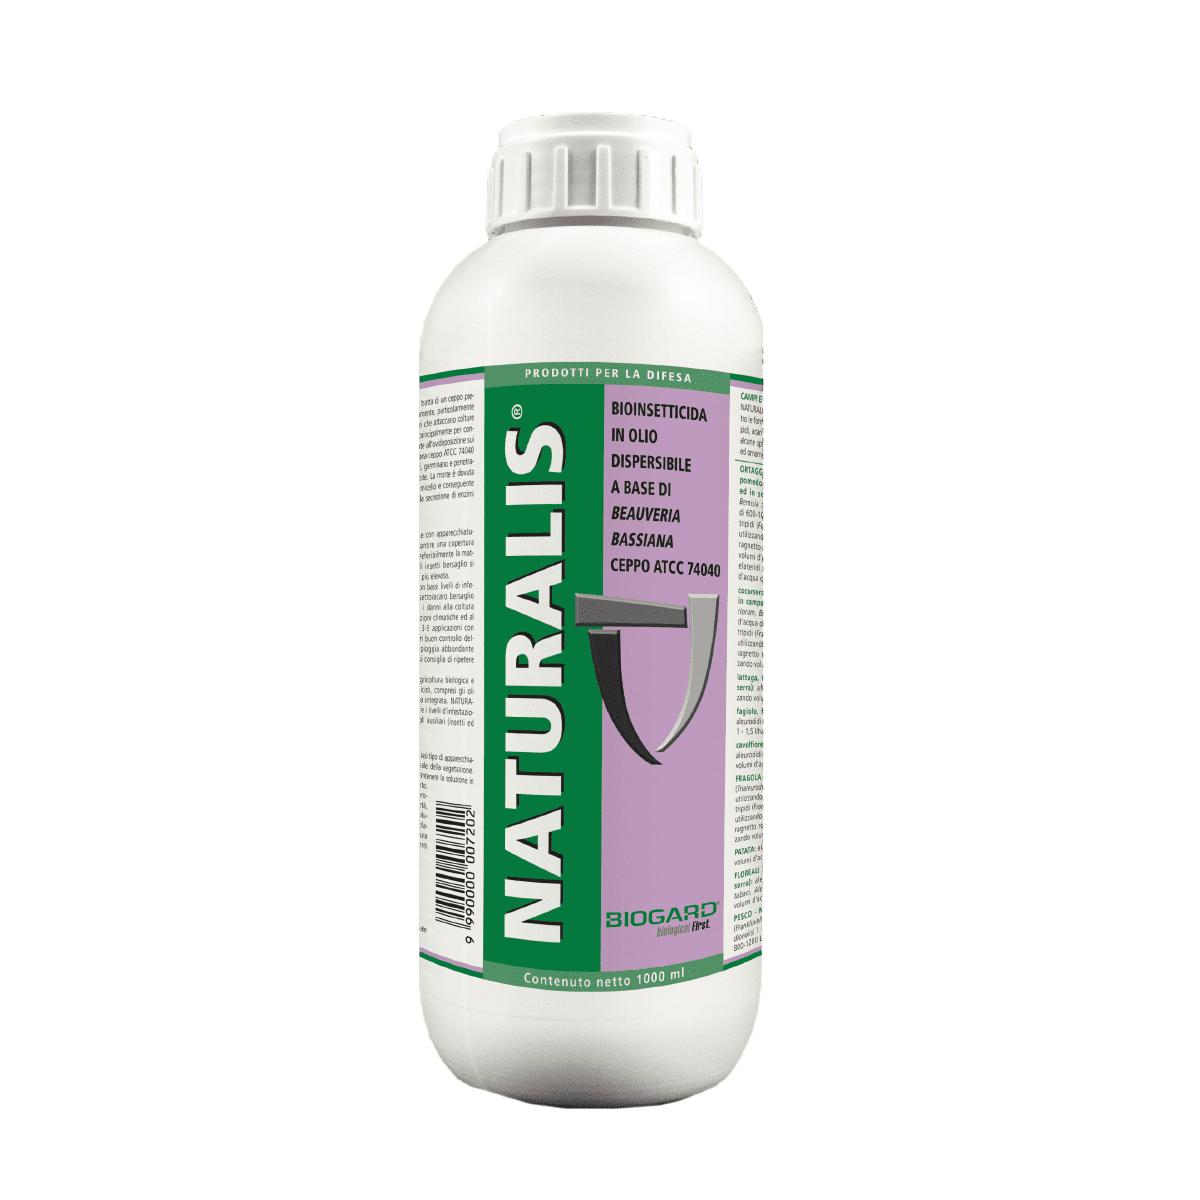 Biogard - Naturalis®